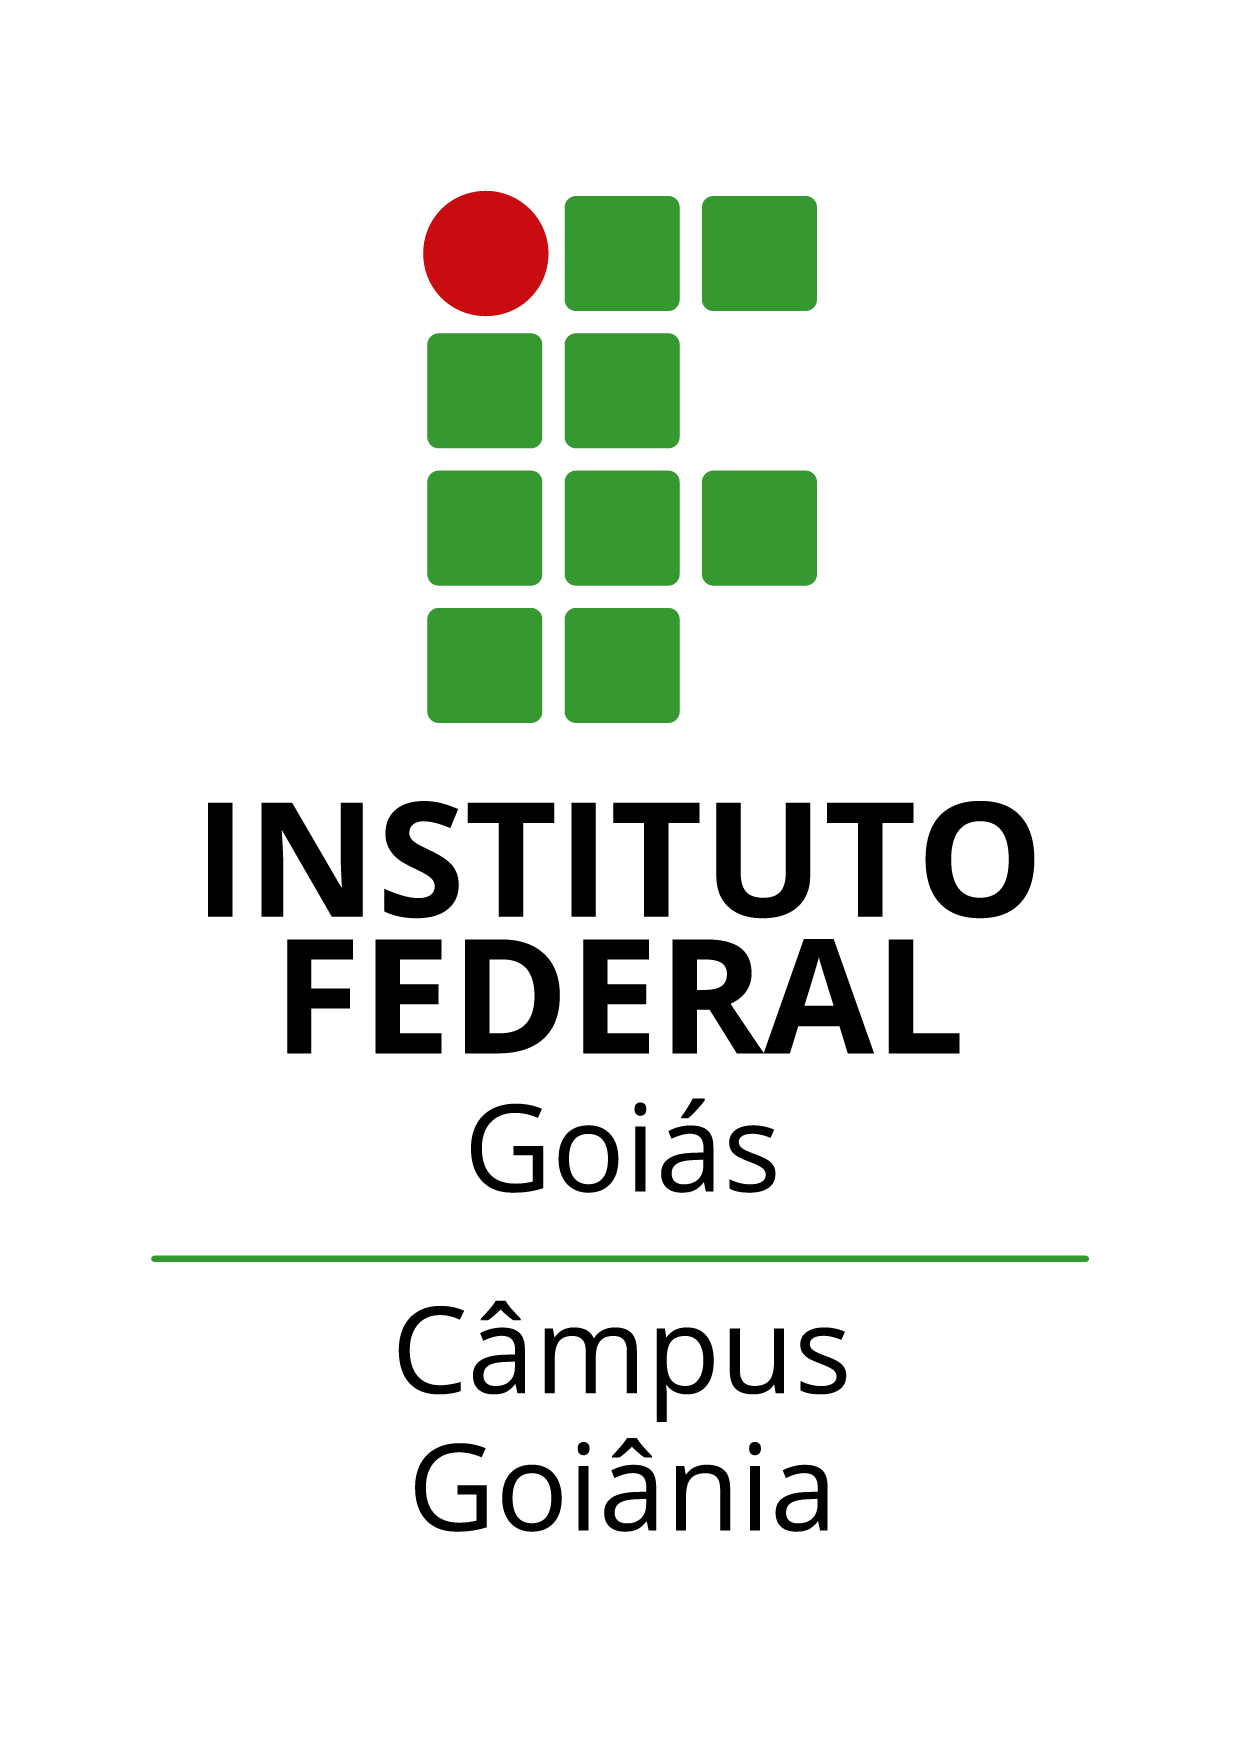 logo-ifg-vertical-goiania